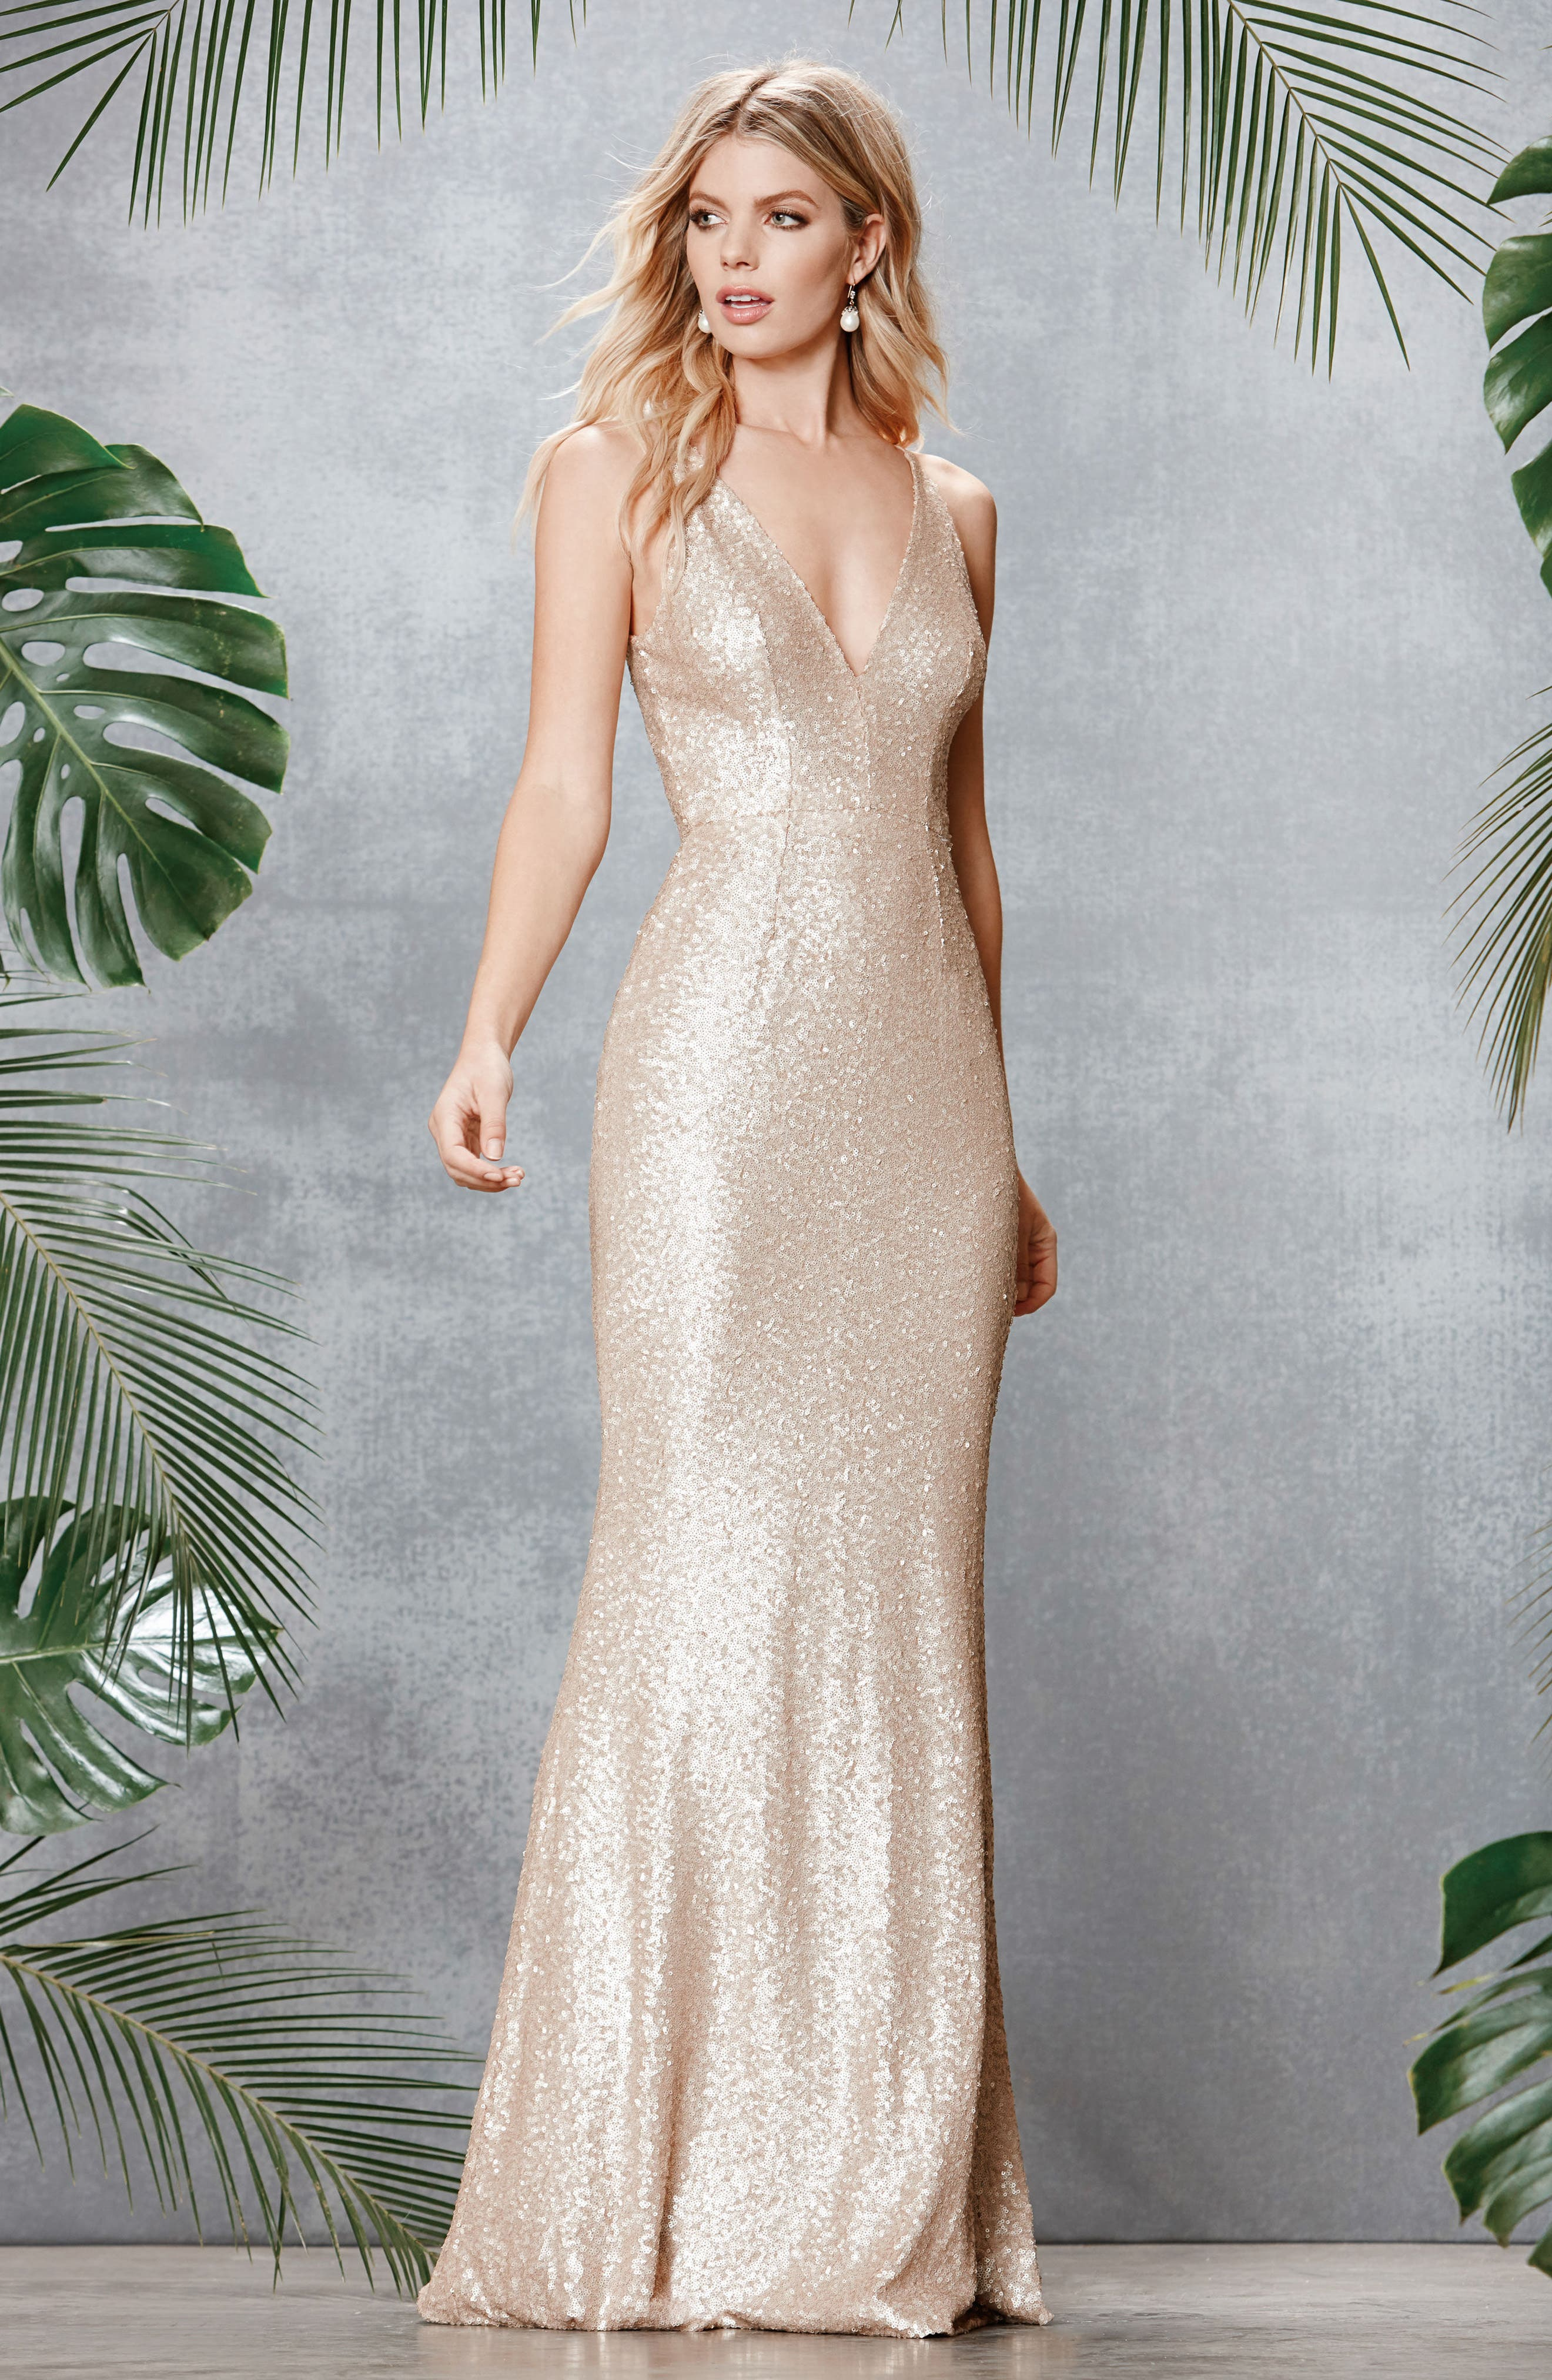 Metallic bridesmaid wedding party dresses nordstrom ombrellifo Image collections